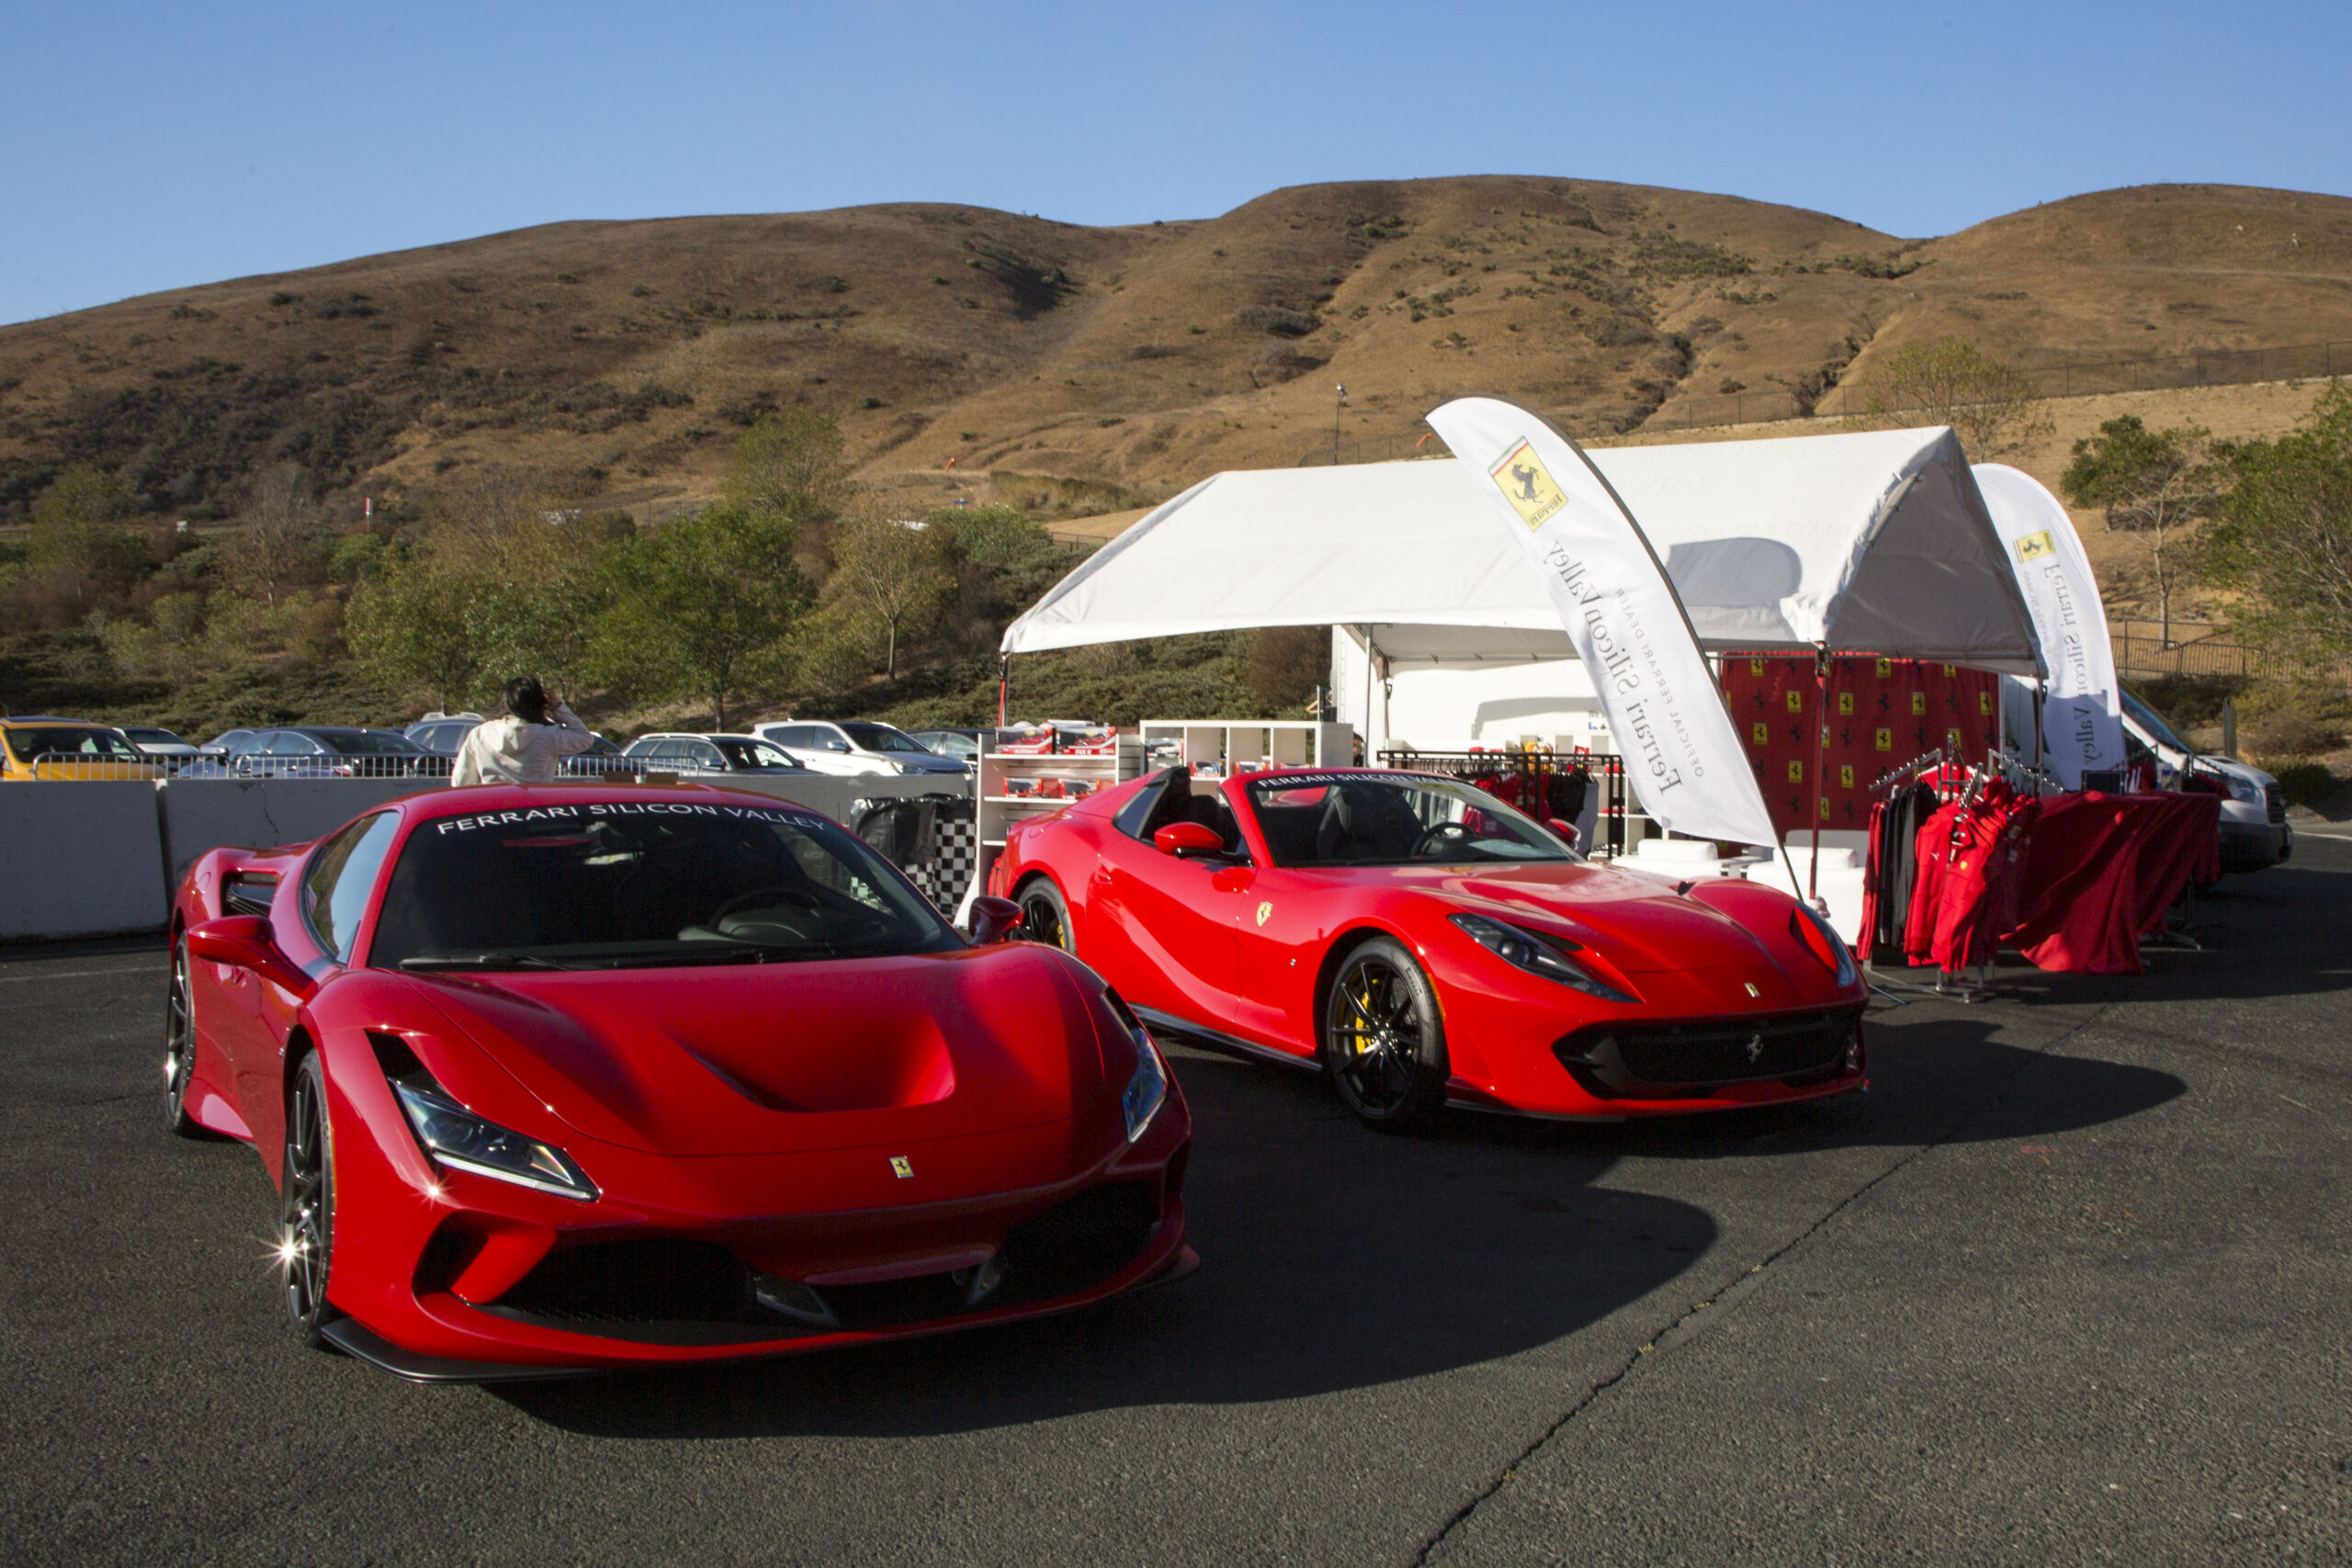 Ferrari Taste of Motosports